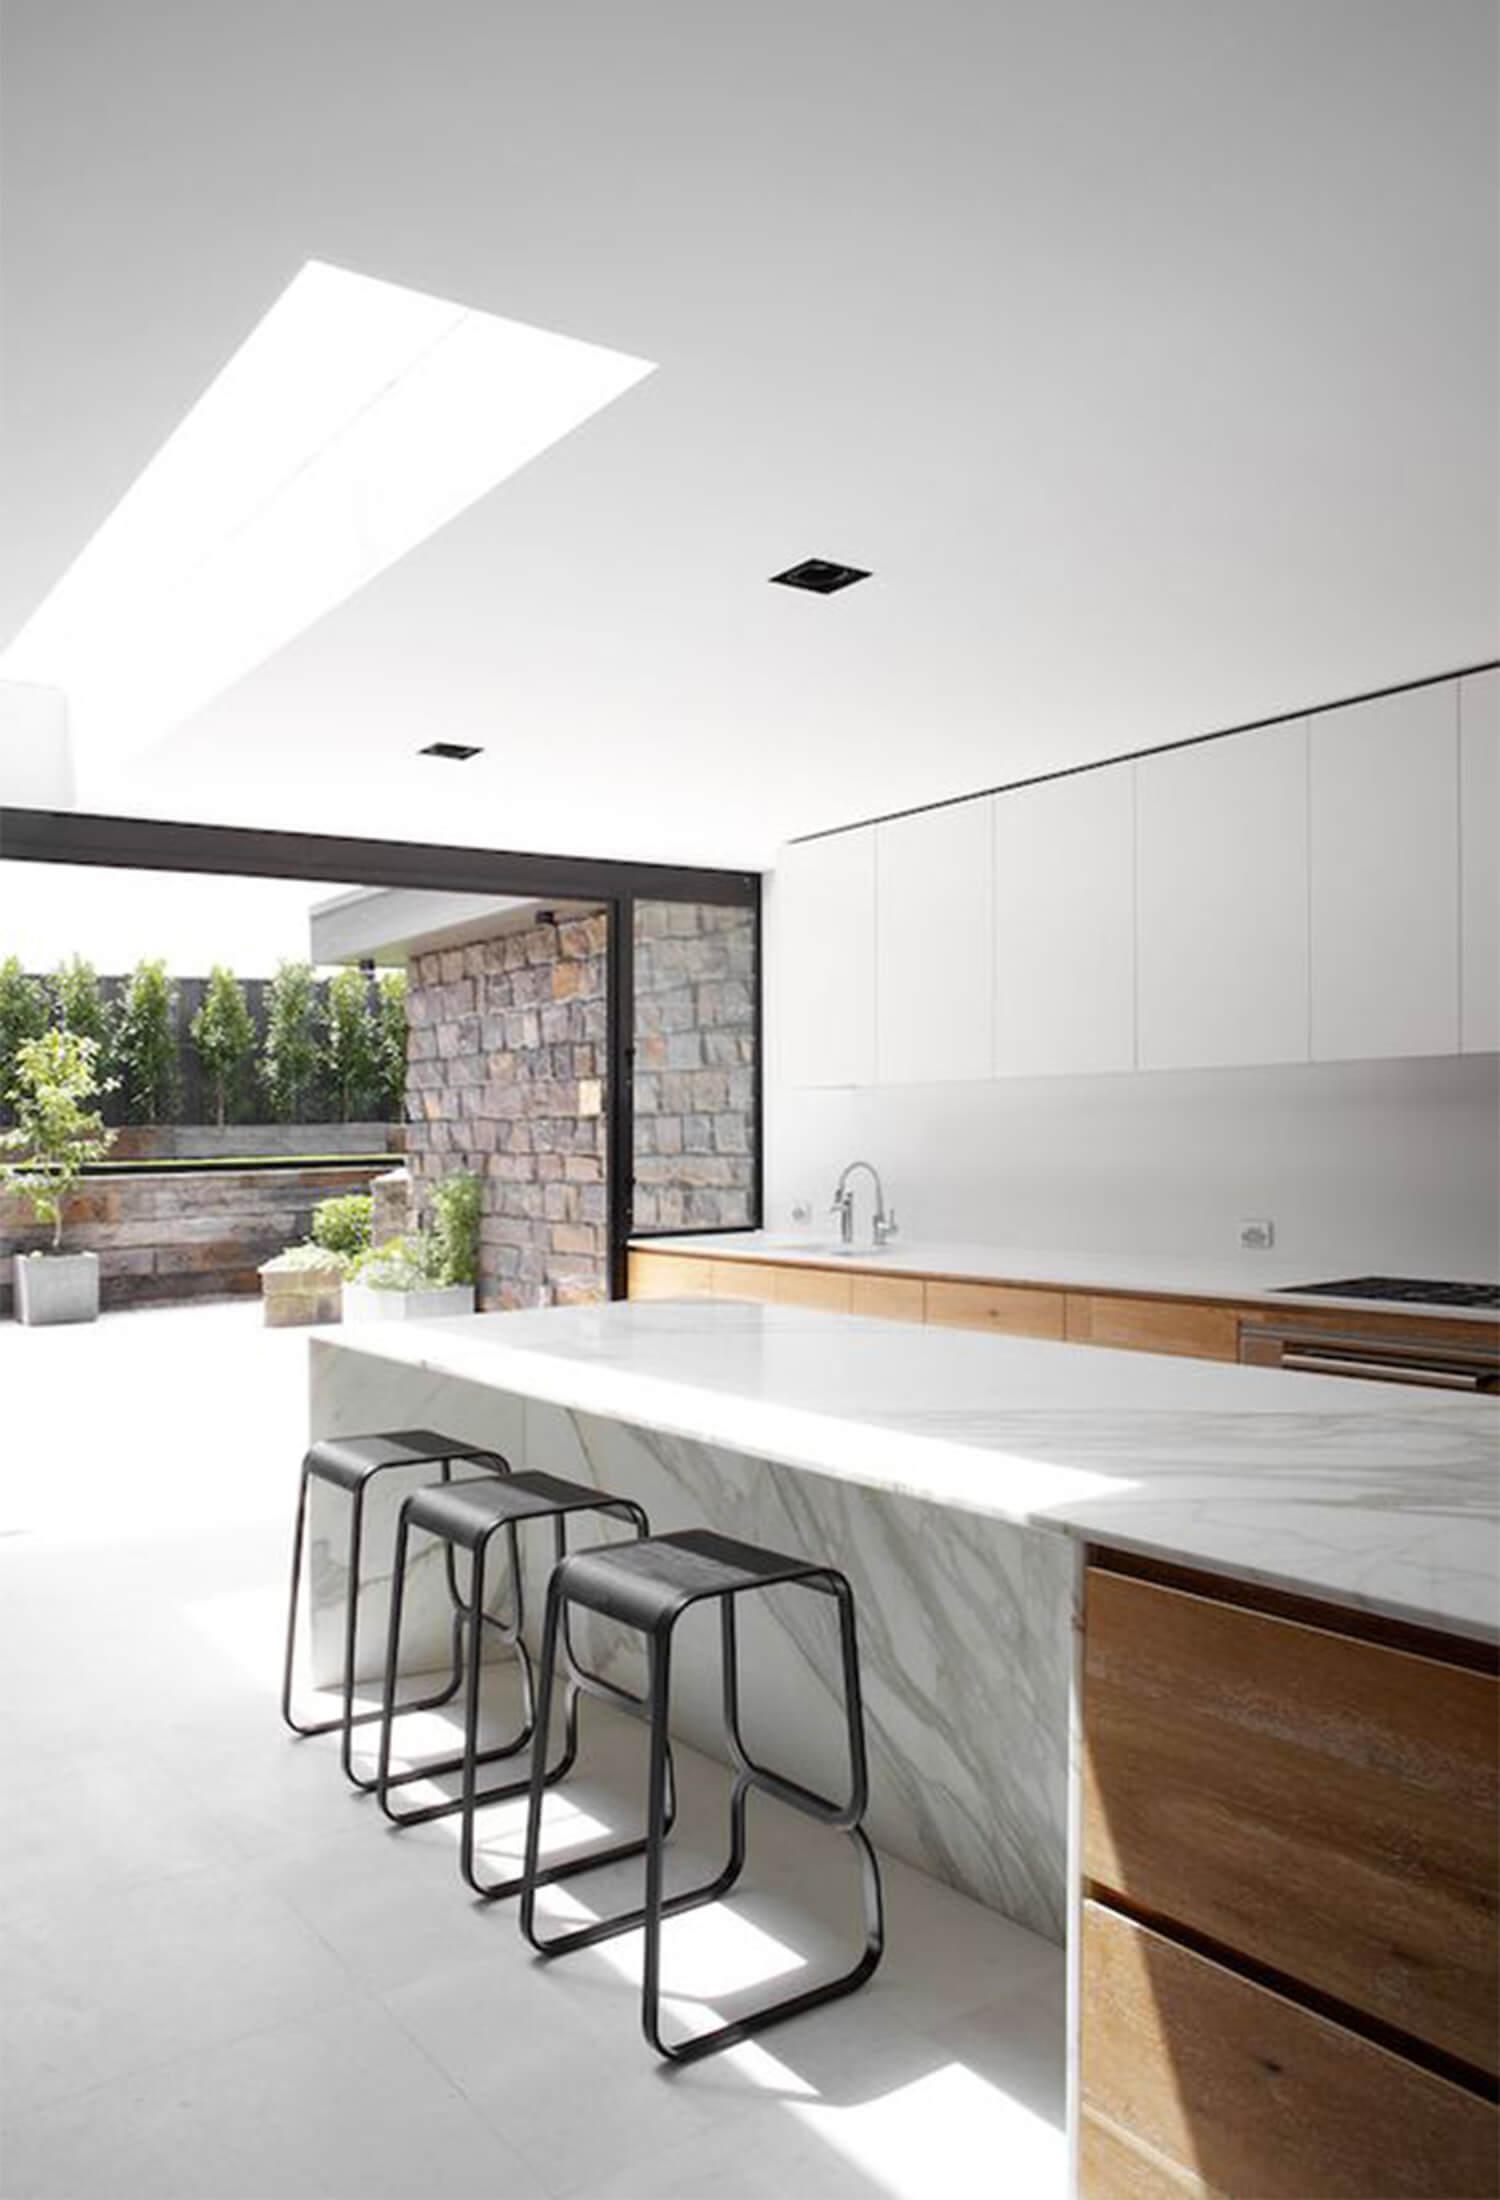 est living timber kitchens dale house robson rak